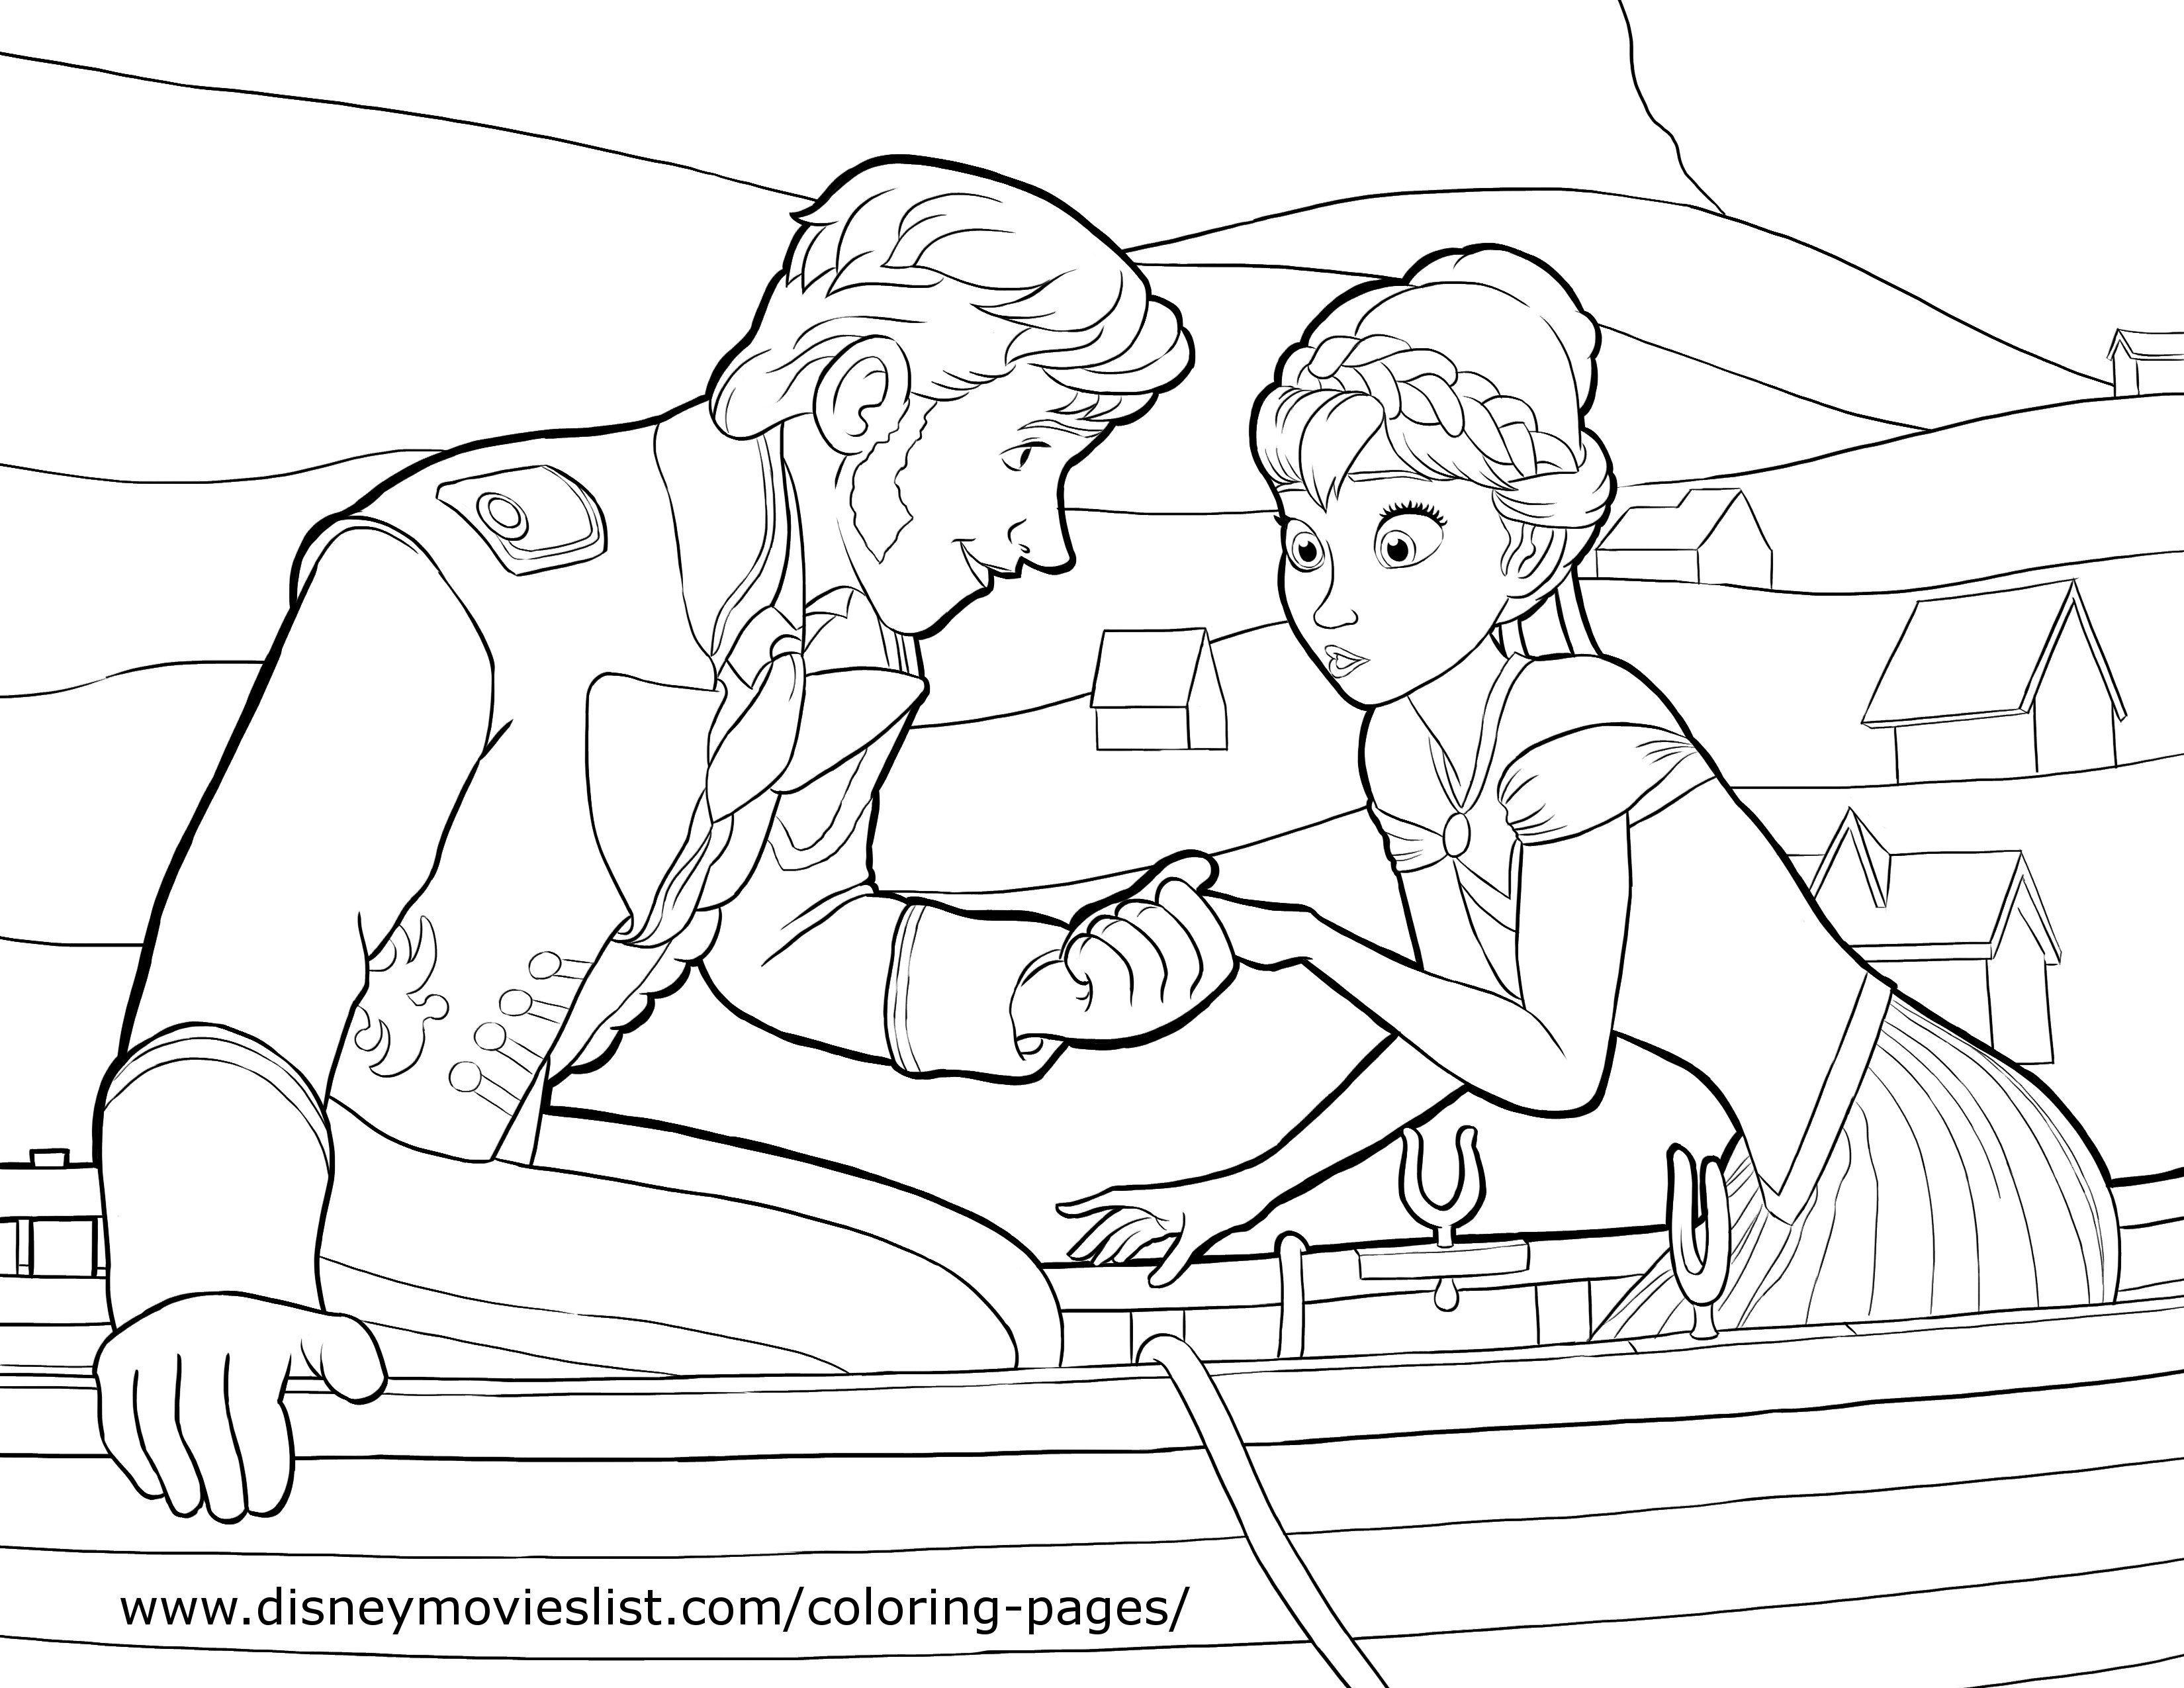 Disney\'s Frozen Coloring Pages Sheet, Free Disney Printable Frozen ...